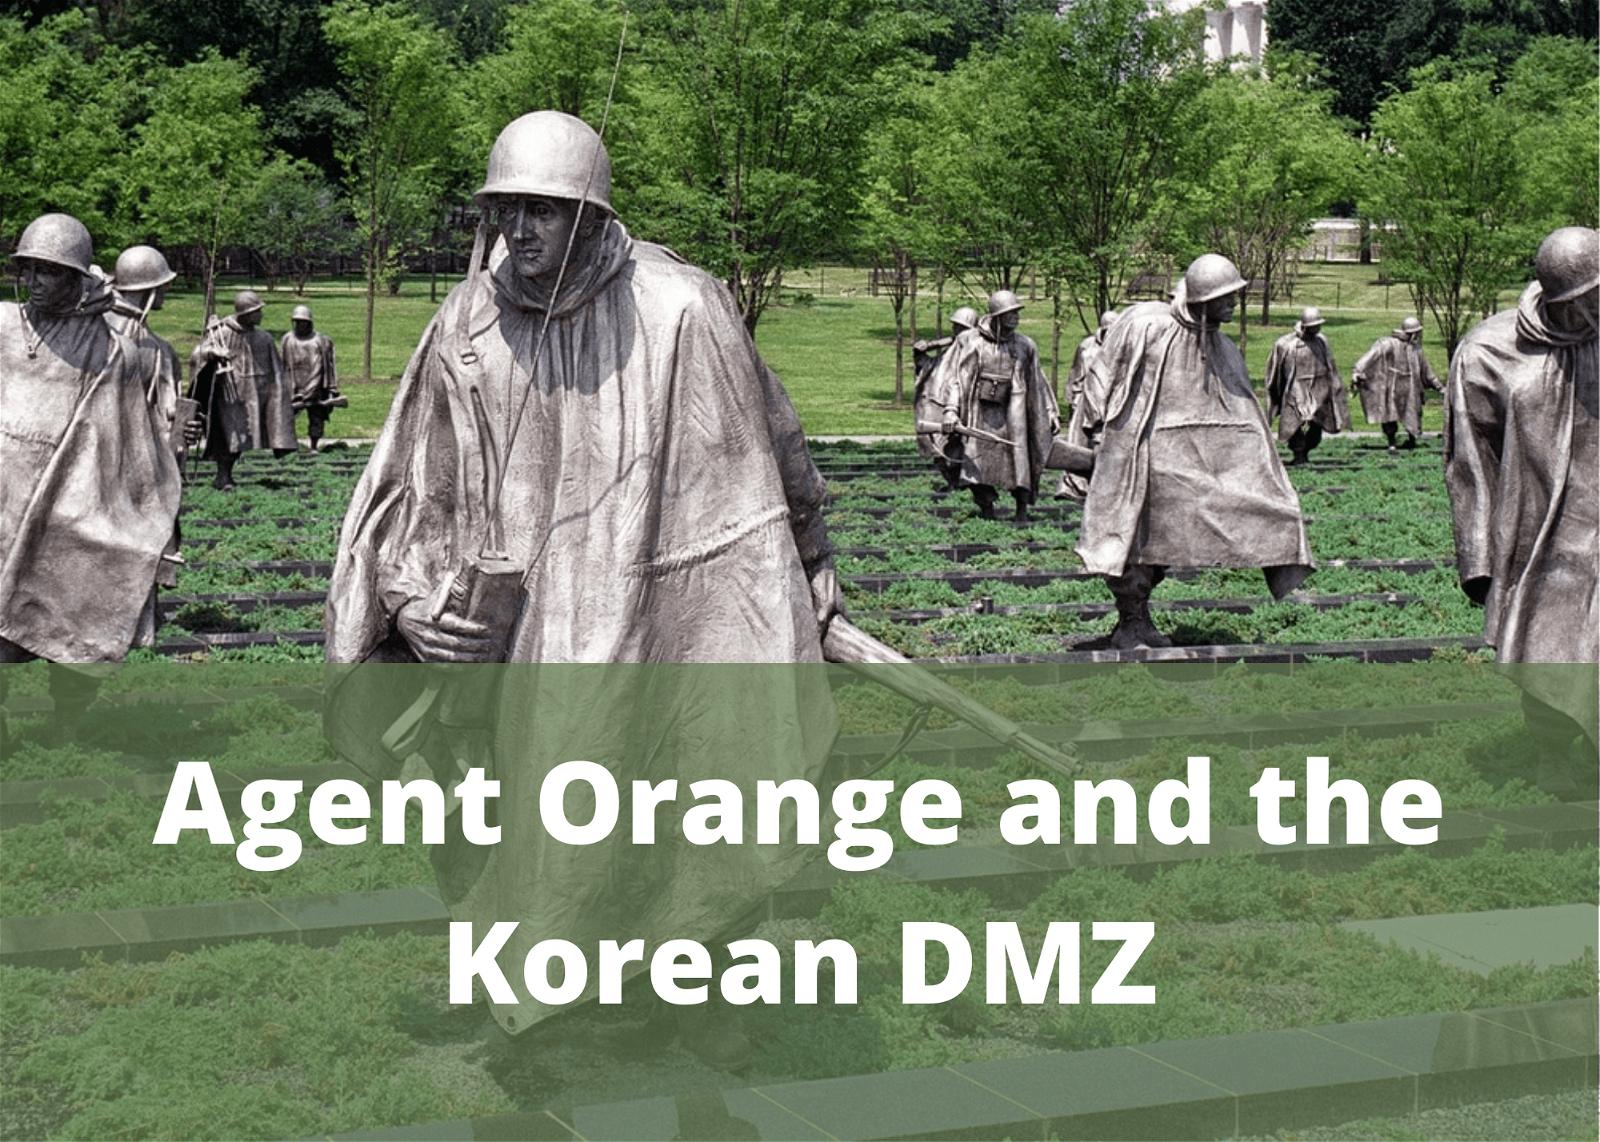 Agent Orange and the Korean DMZ